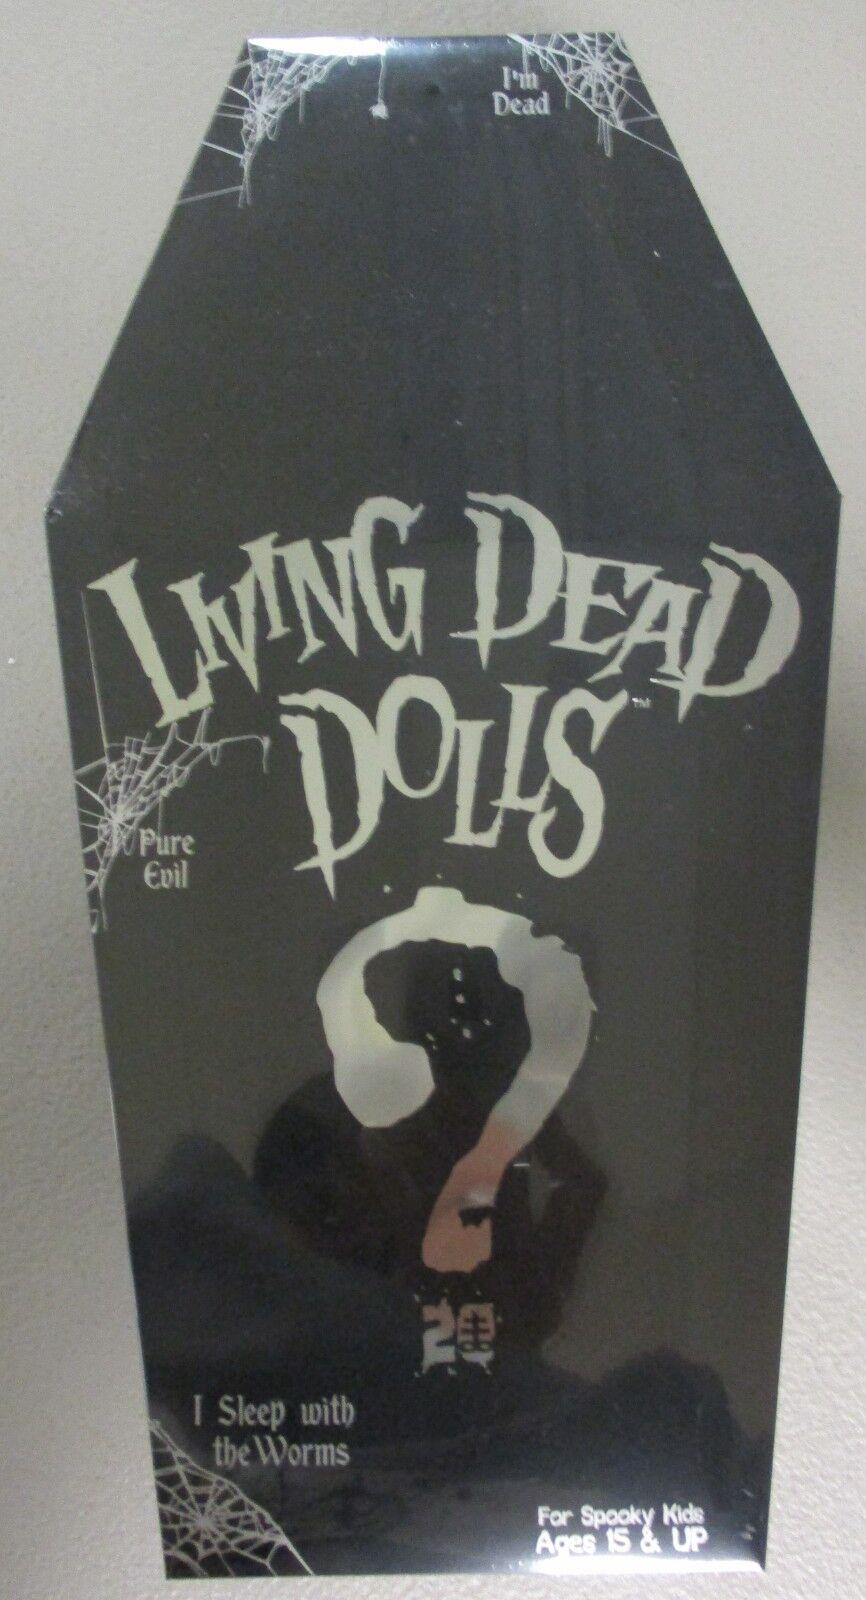 Living Dead bambolas 20th Anniversary Series  Mystery cifra Rare Posey (328) Mezco  moda classica